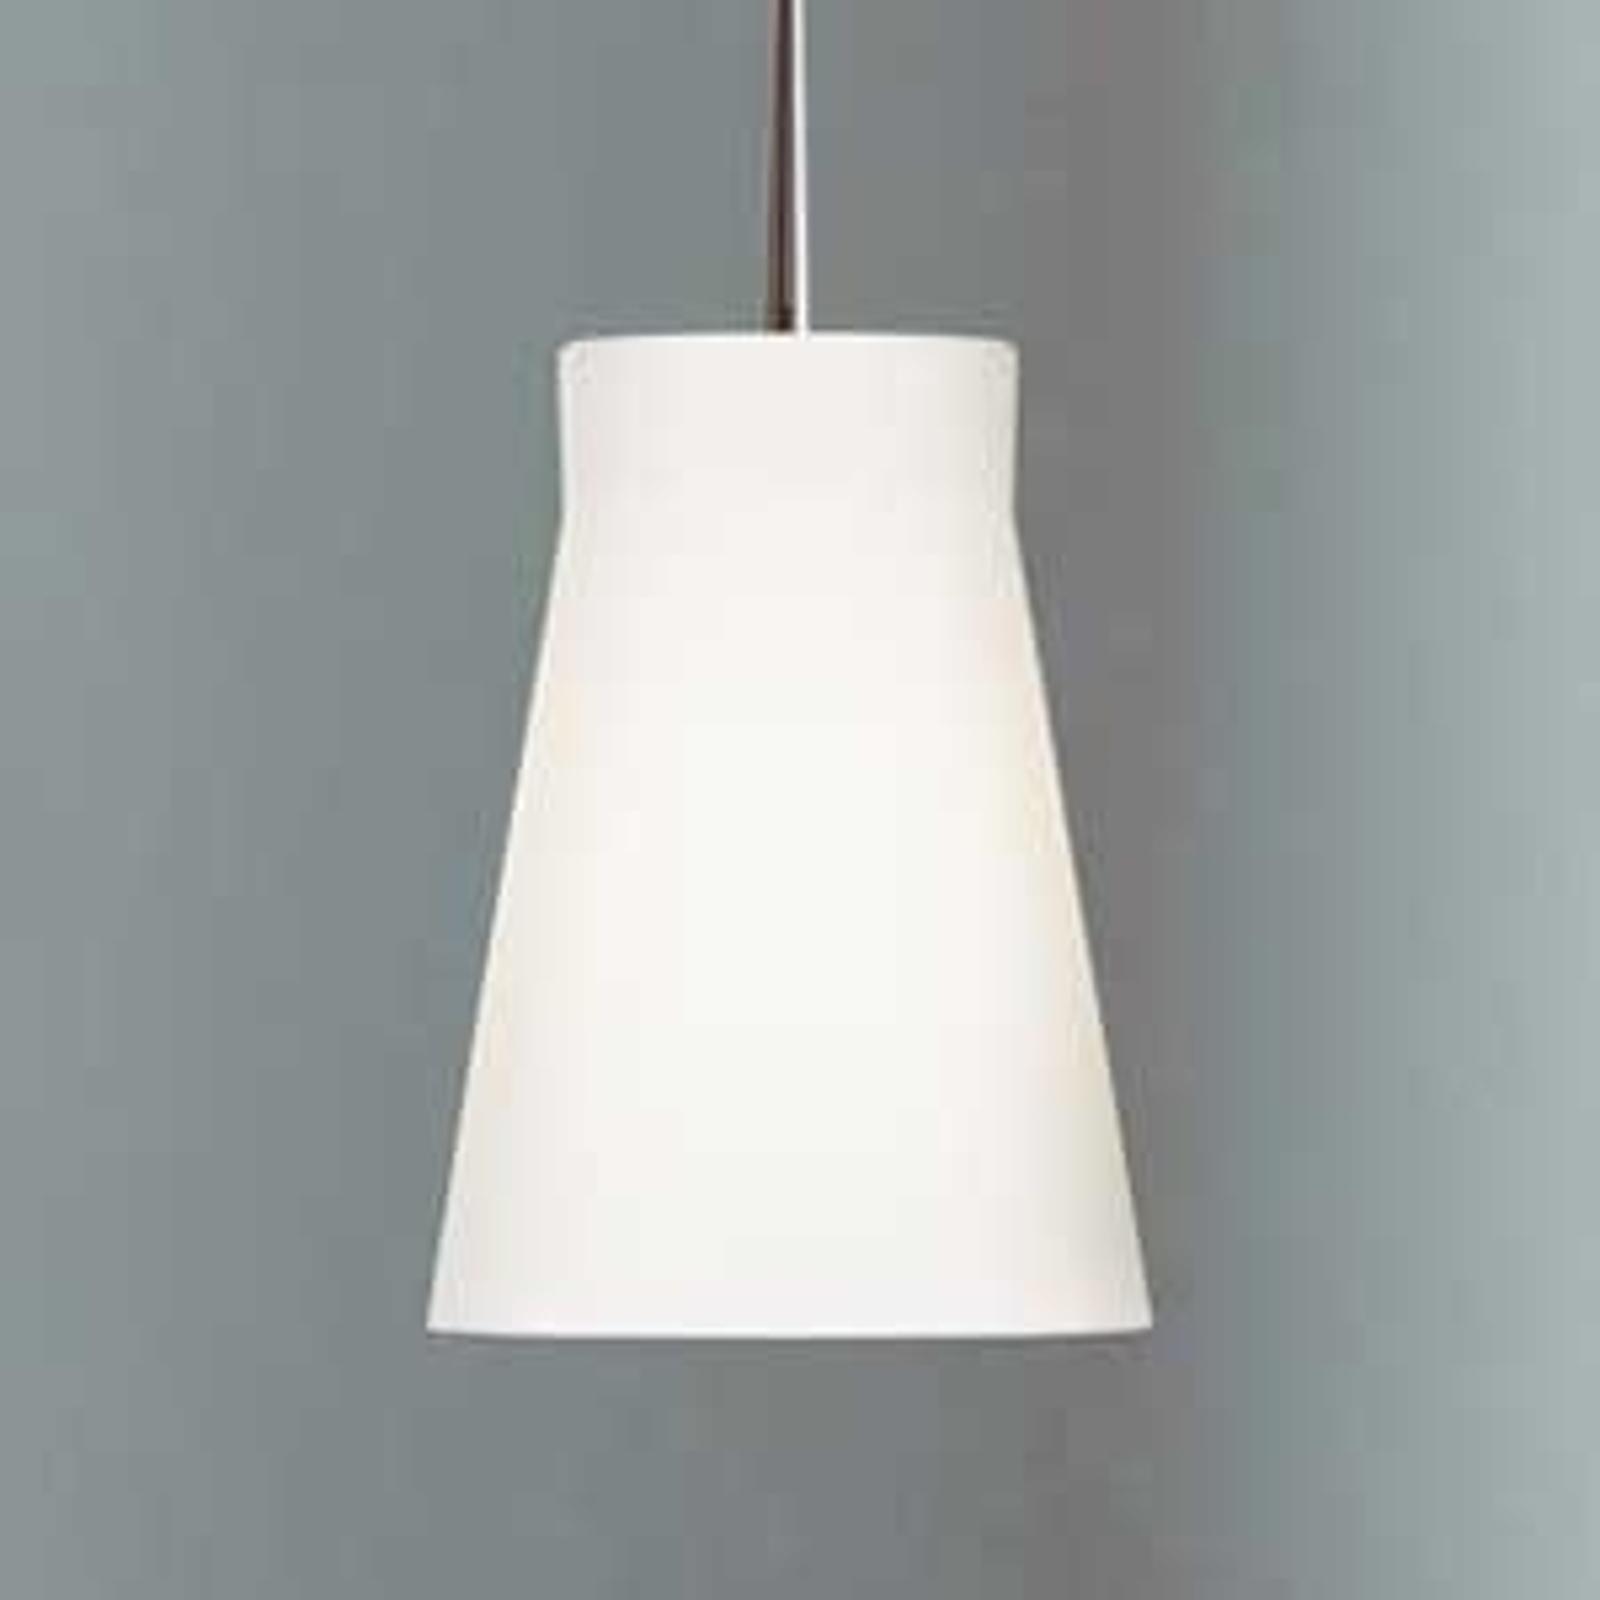 Casablanca Momo – jedno-plameňová závesná lampa_2000318_1